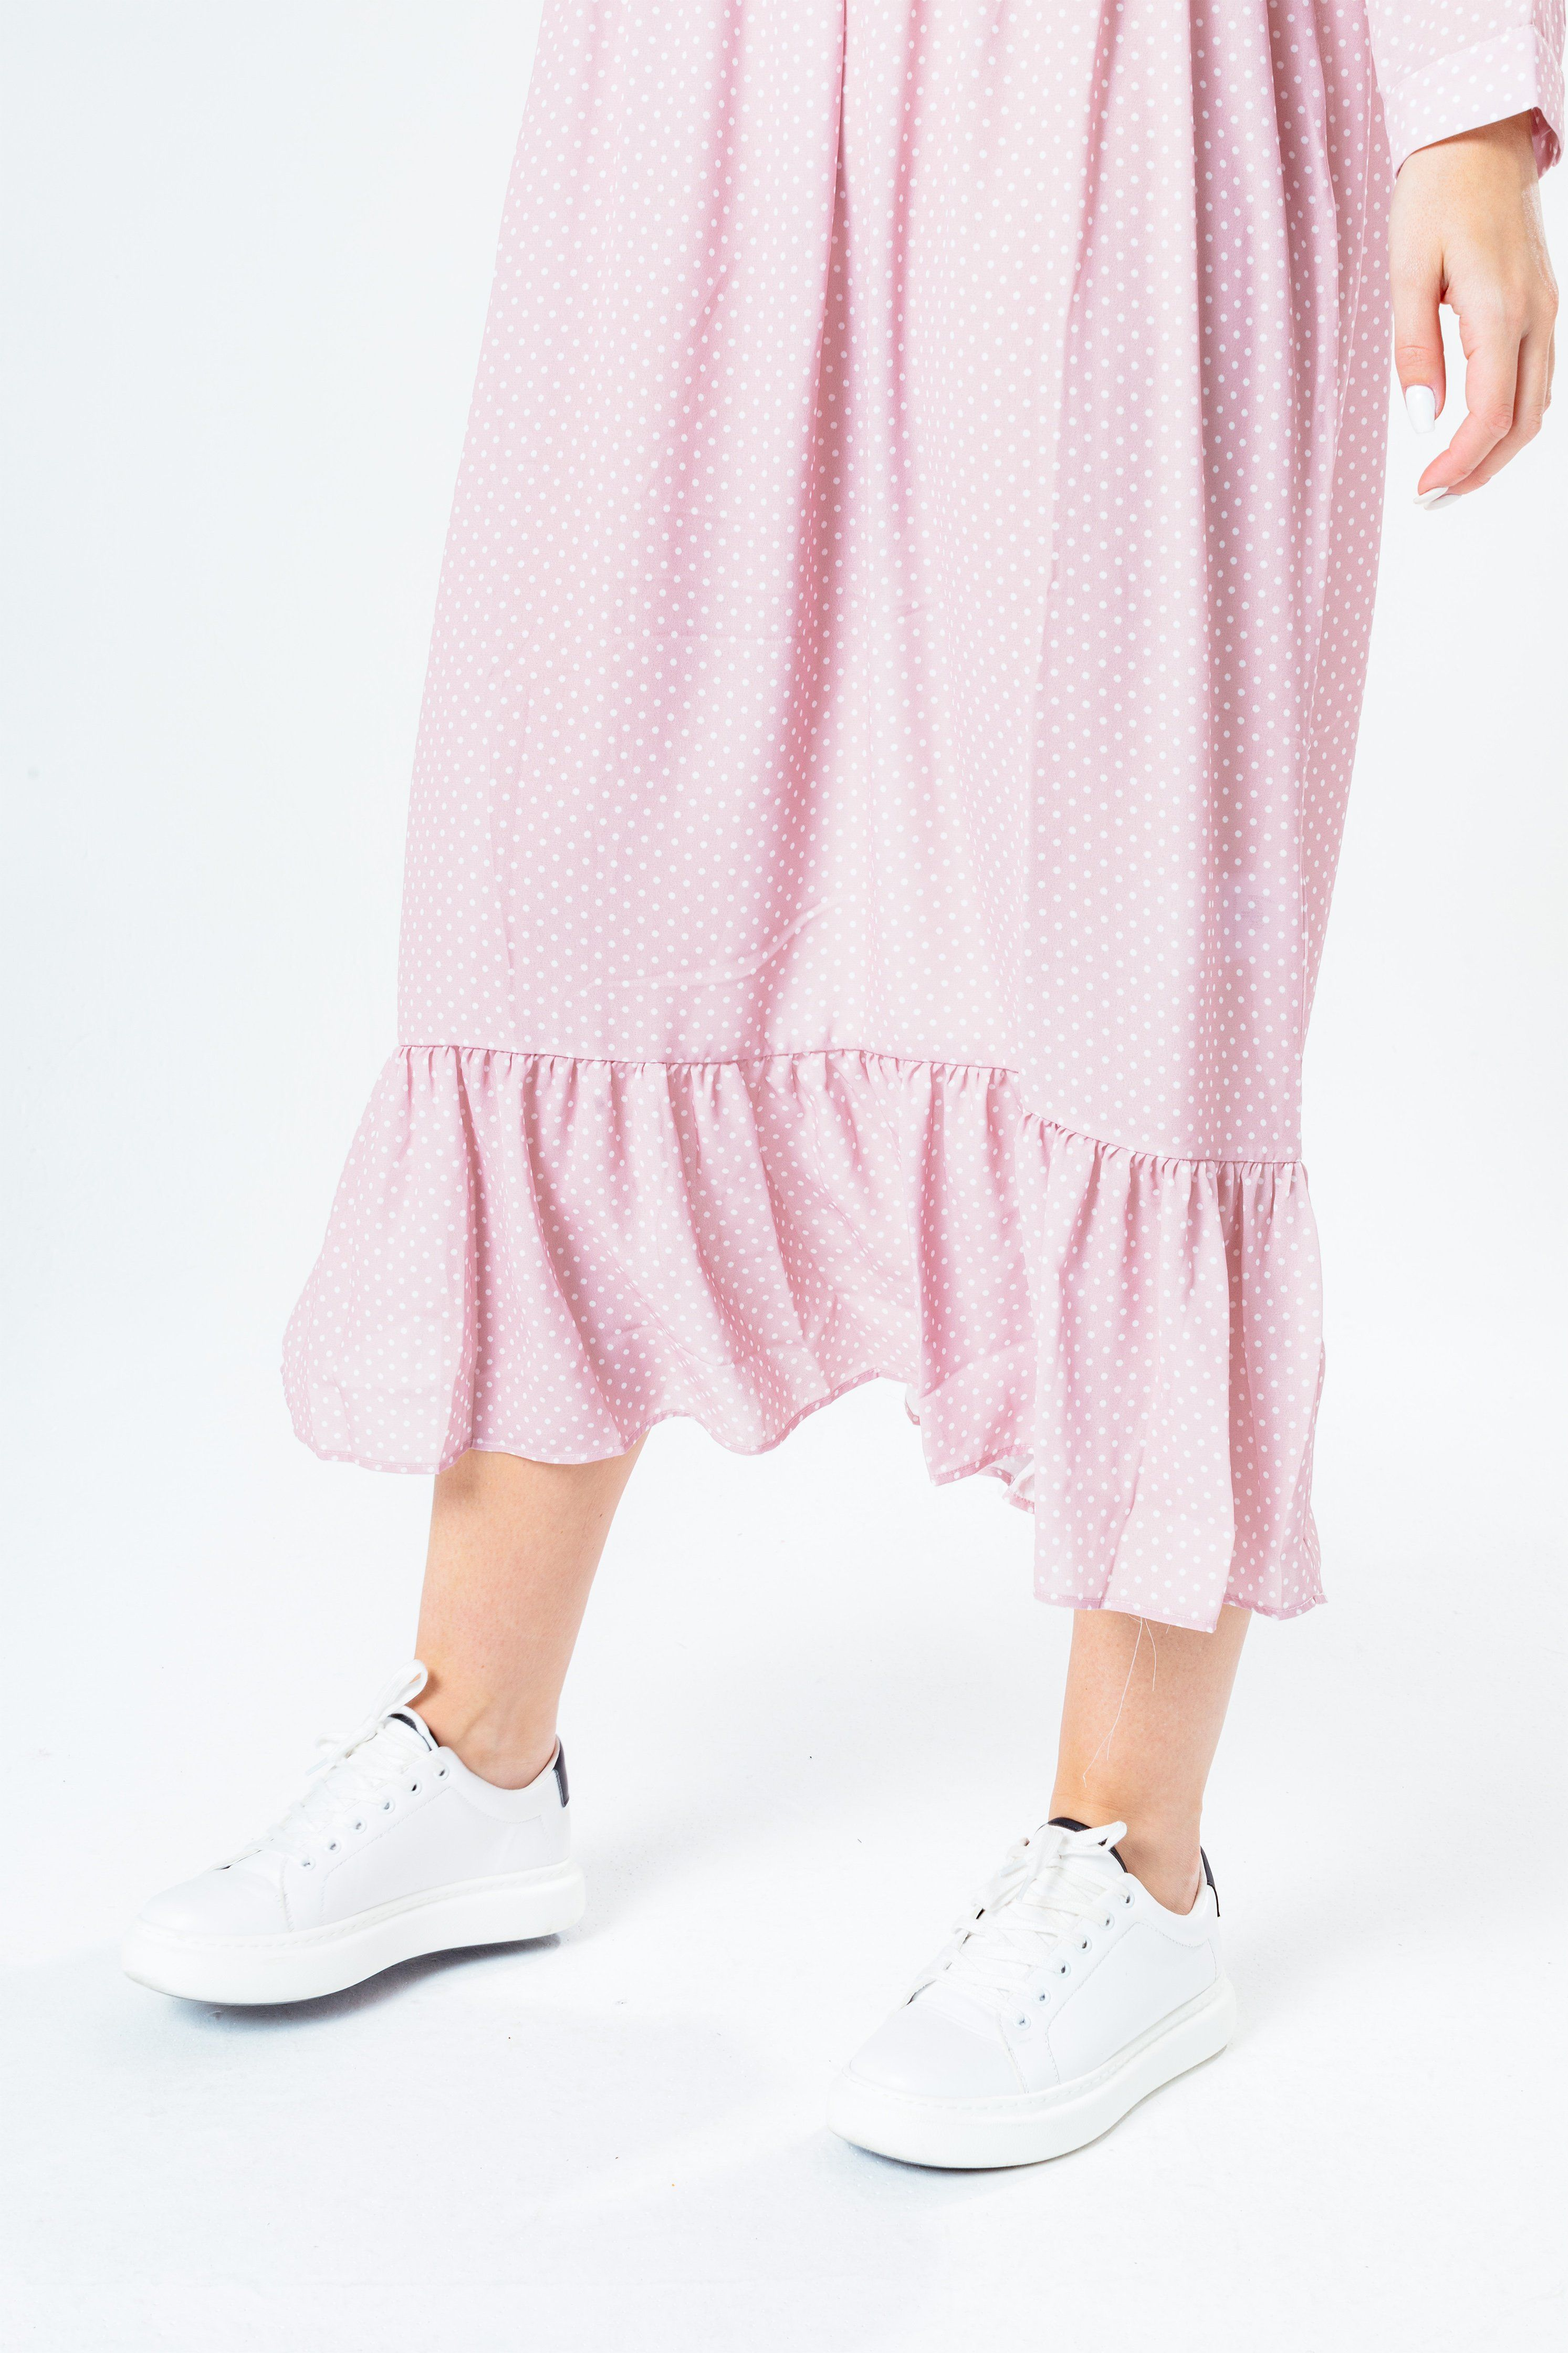 Hype Pink Polka Women's Dot Dress